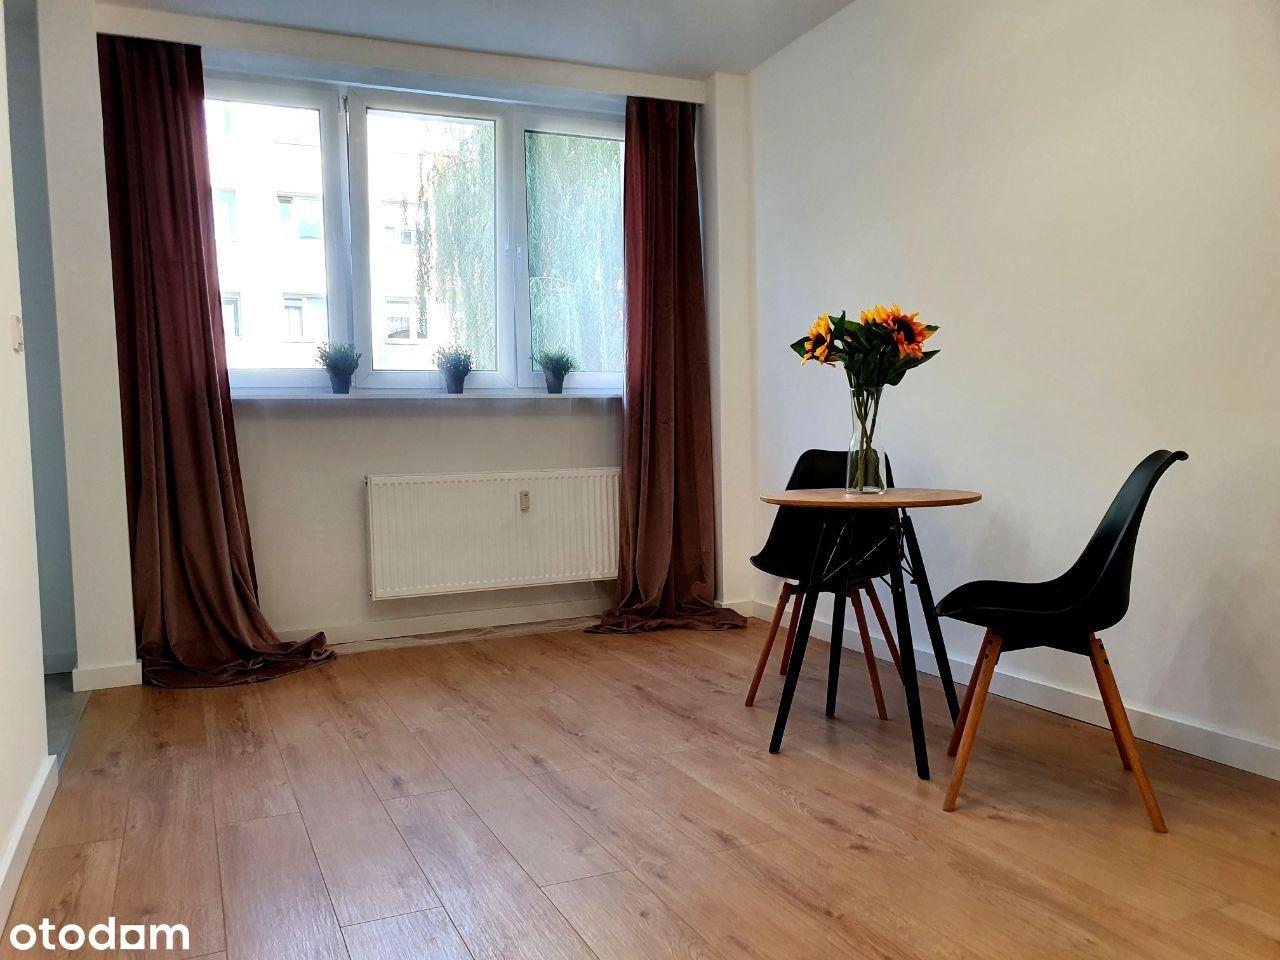 Mieszkanie po remoncie, 1 piętro, 3 pokoje